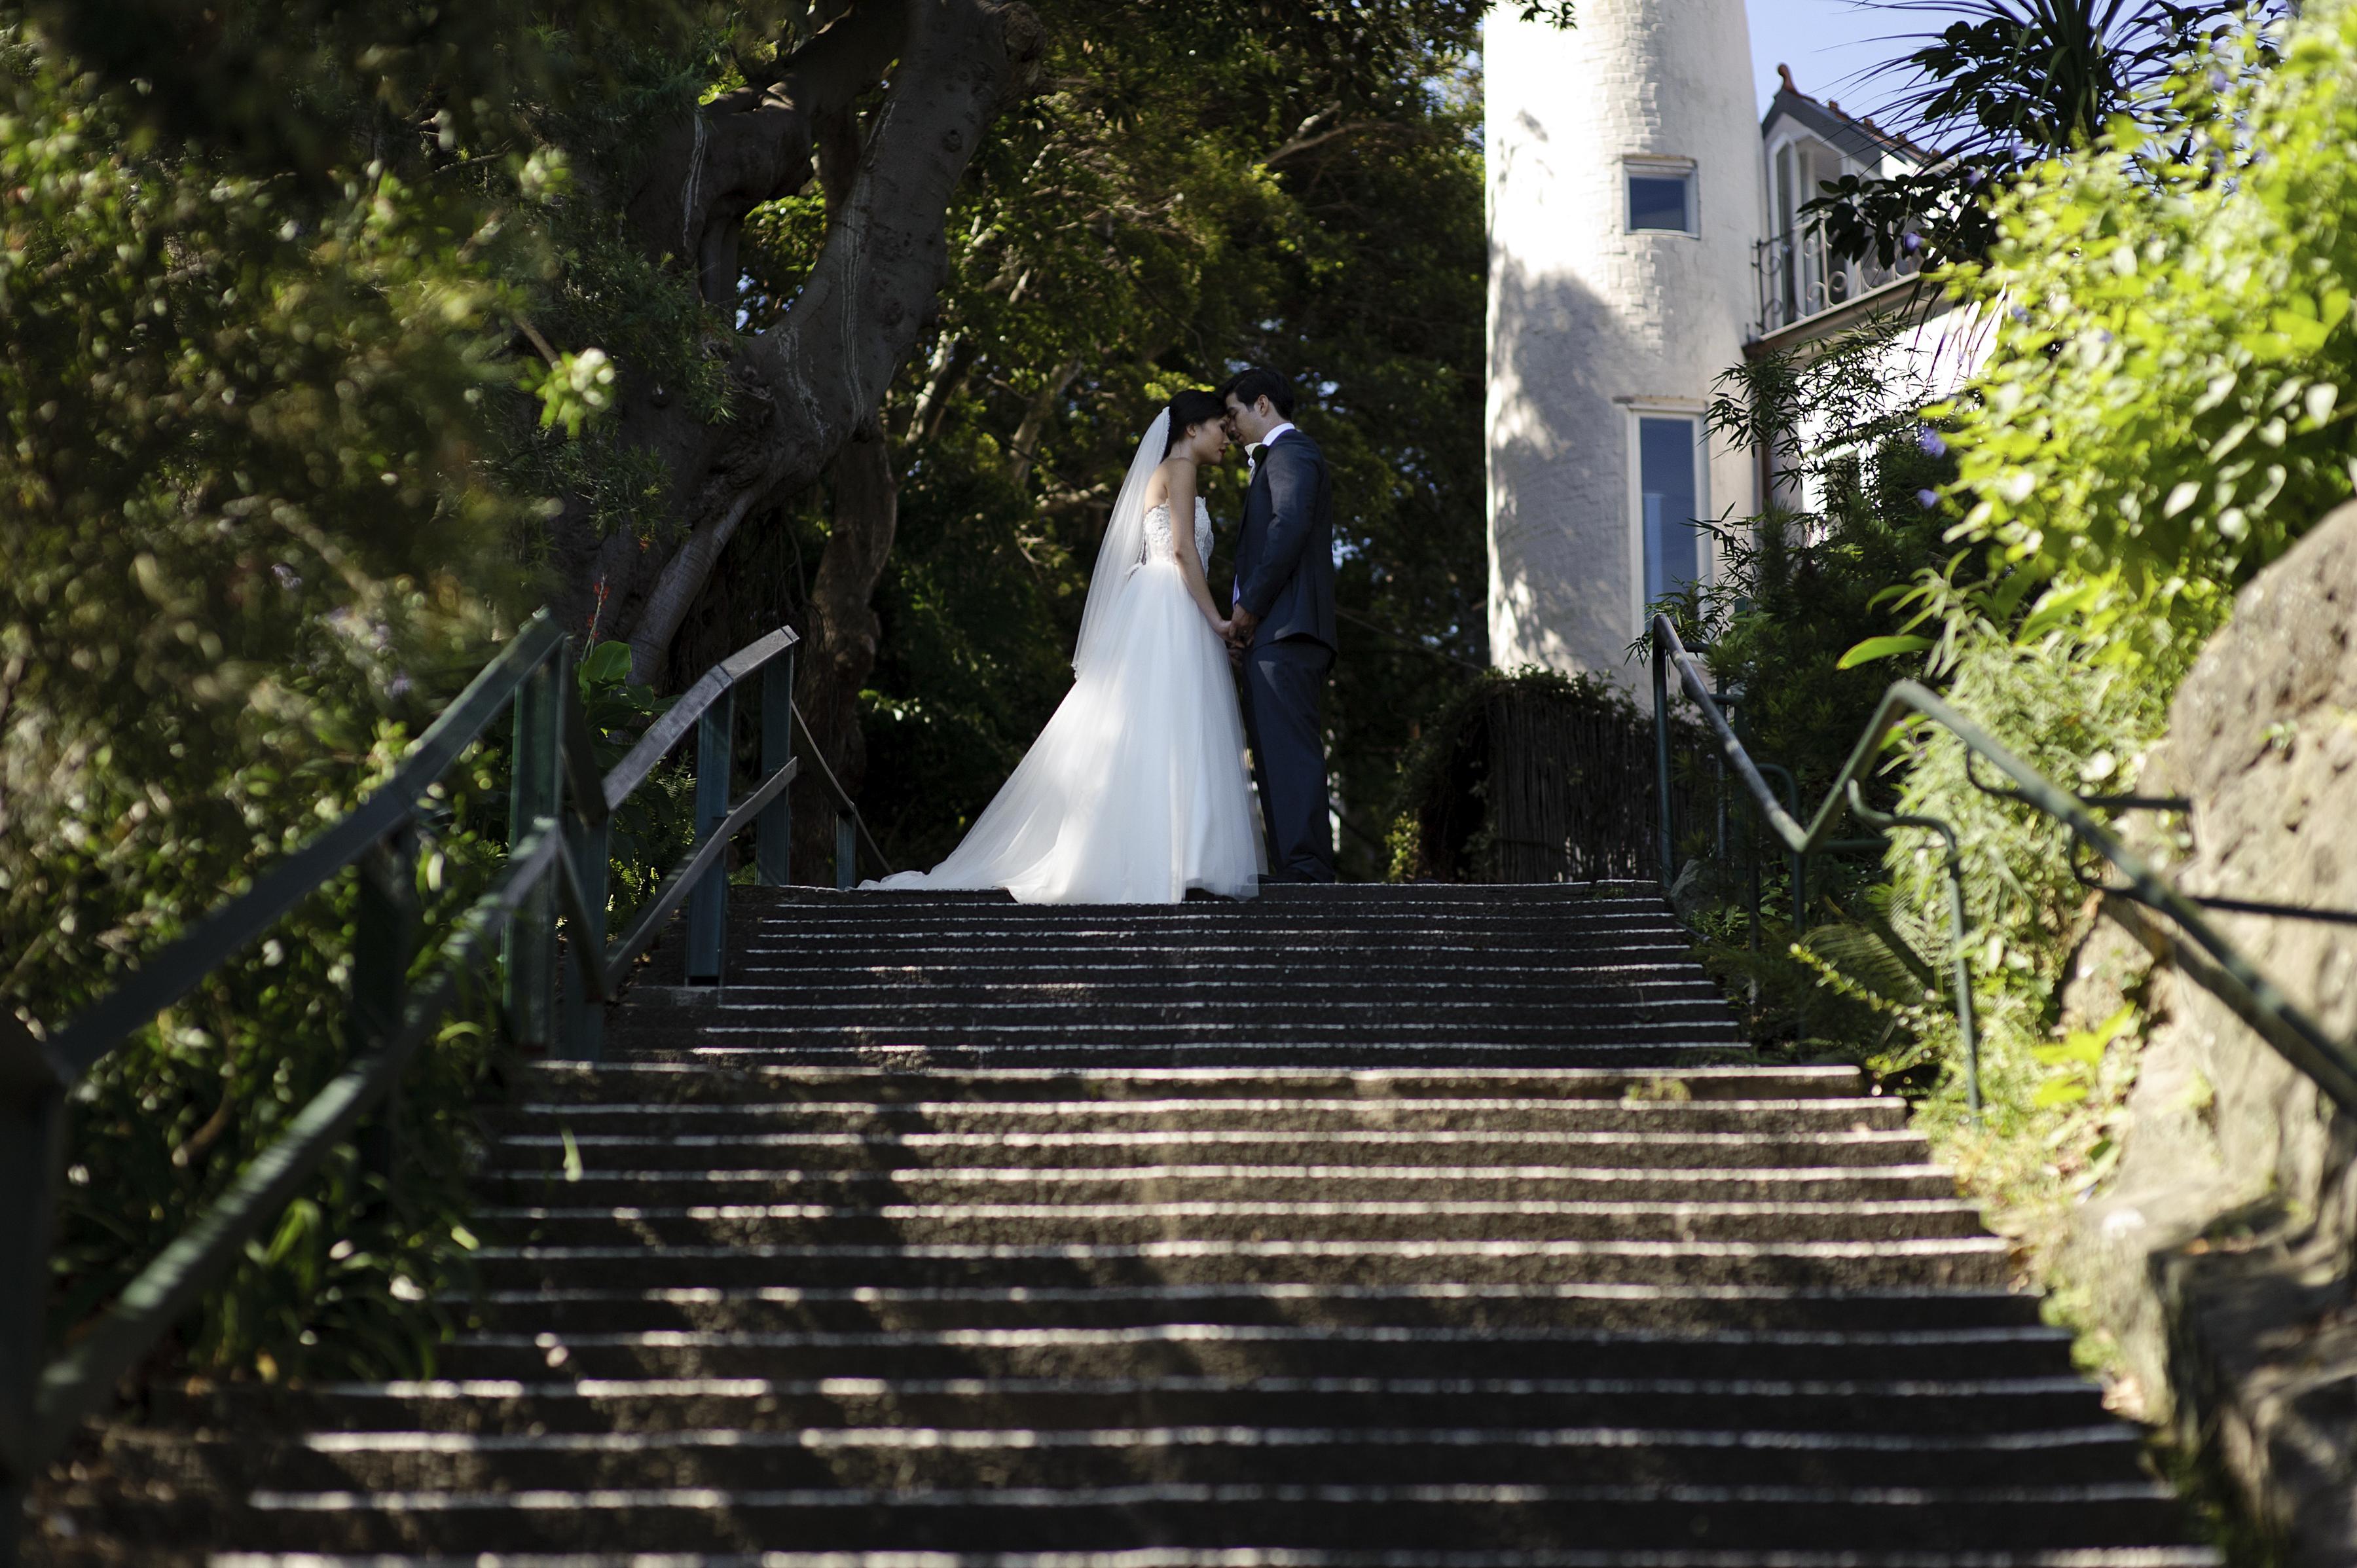 https://sleeklens.com/wp-content/uploads/2018/09/wedding-lightroom-presets-signature-bride-groom-before-2.jpg